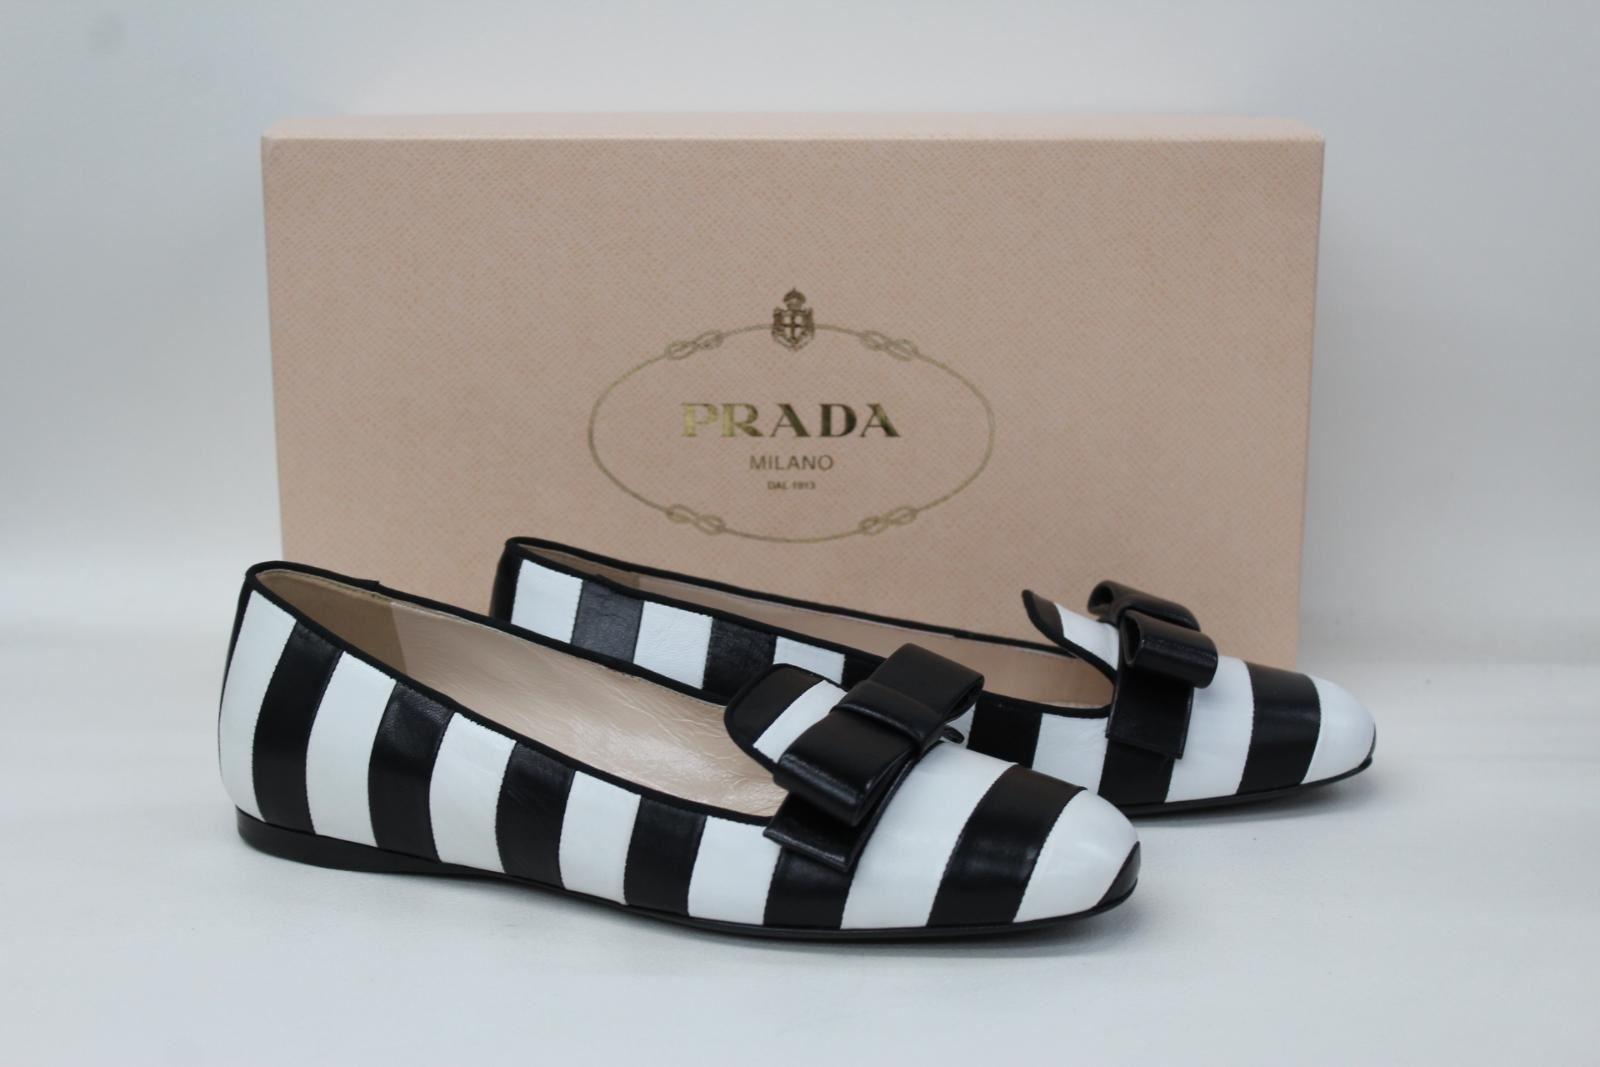 PRADA-Ladies-Black-amp-White-Leather-Bow-Detail-Flat-Slip-On-Shoes-UK3-5-EU36-BNIB